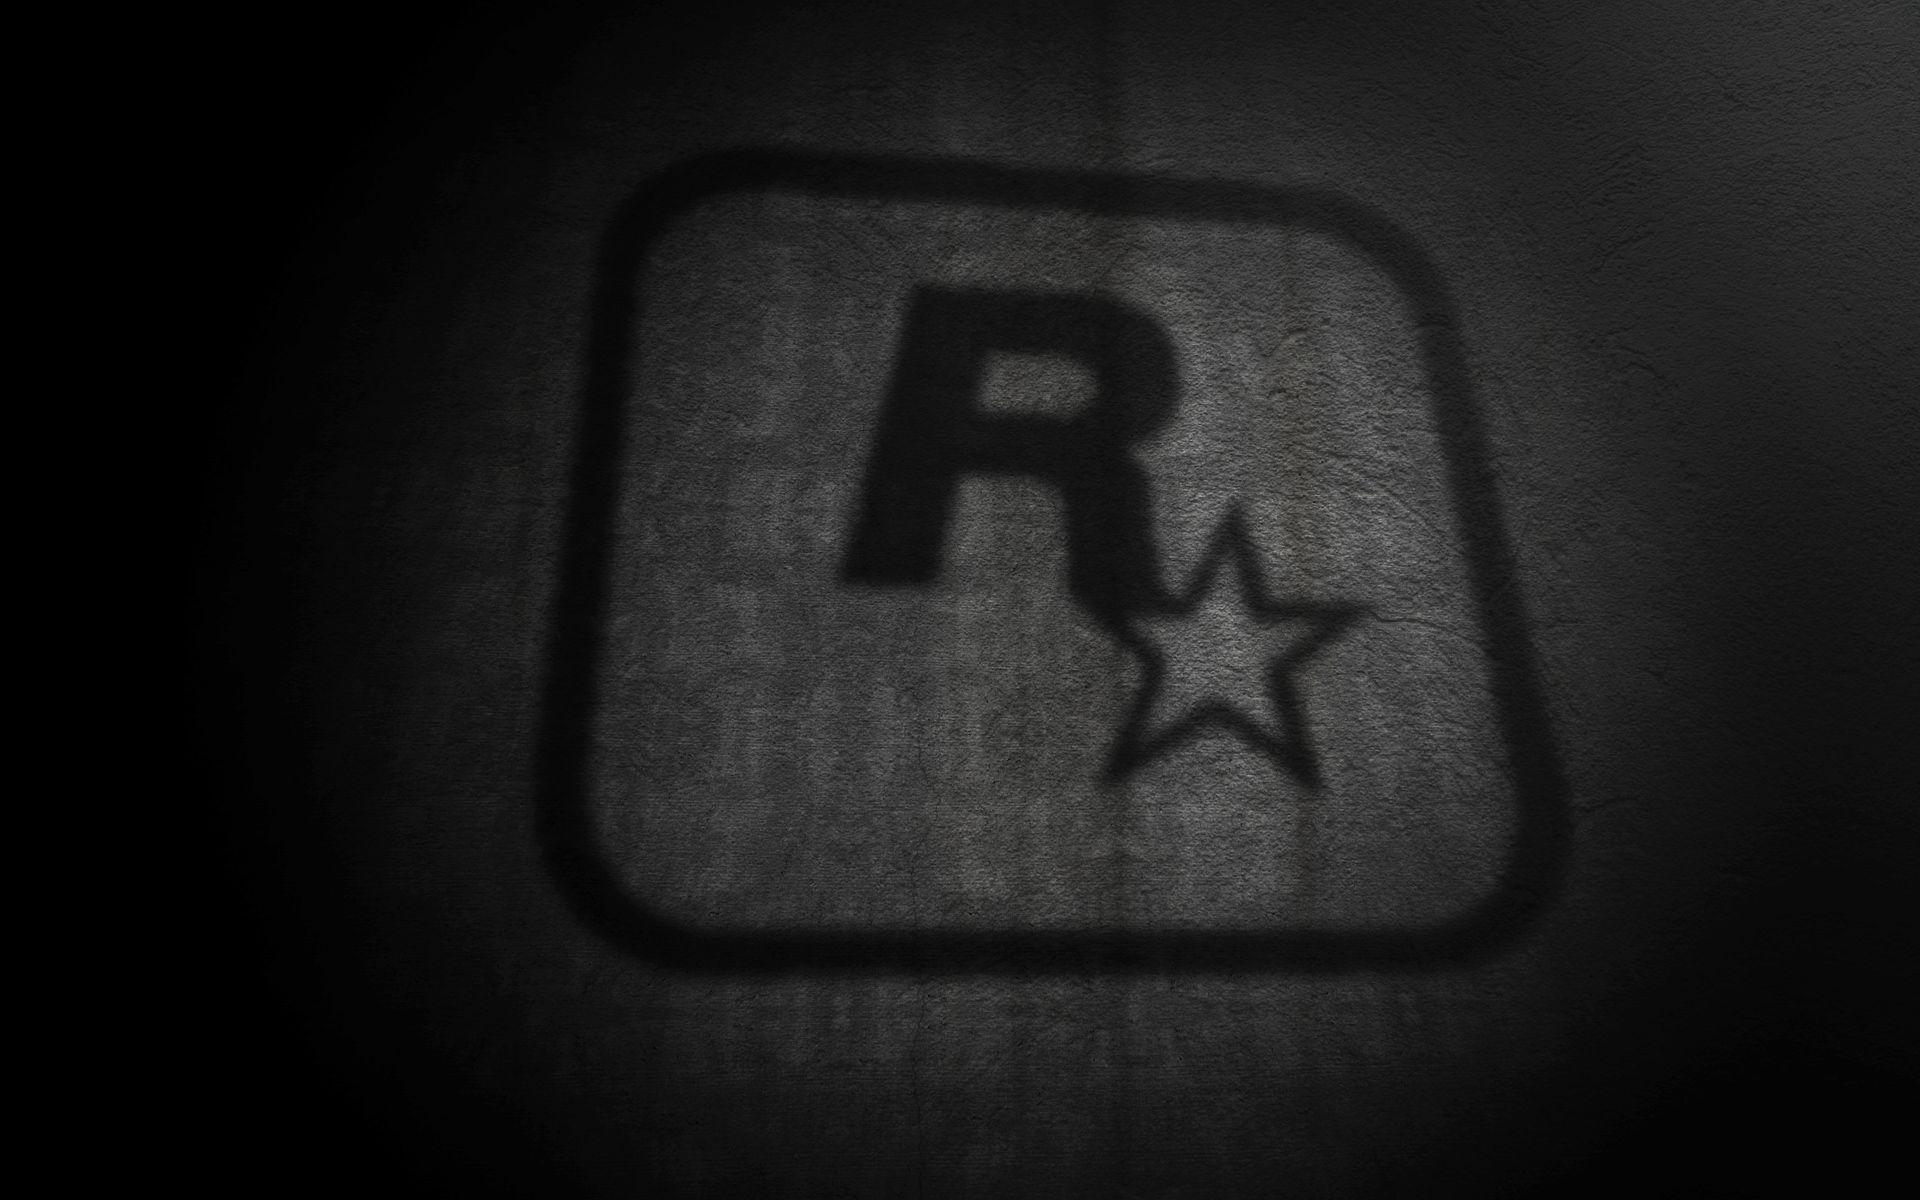 Ipad Retina Hd Wallpaper Rockstar Games: Rockstar Games Wallpapers